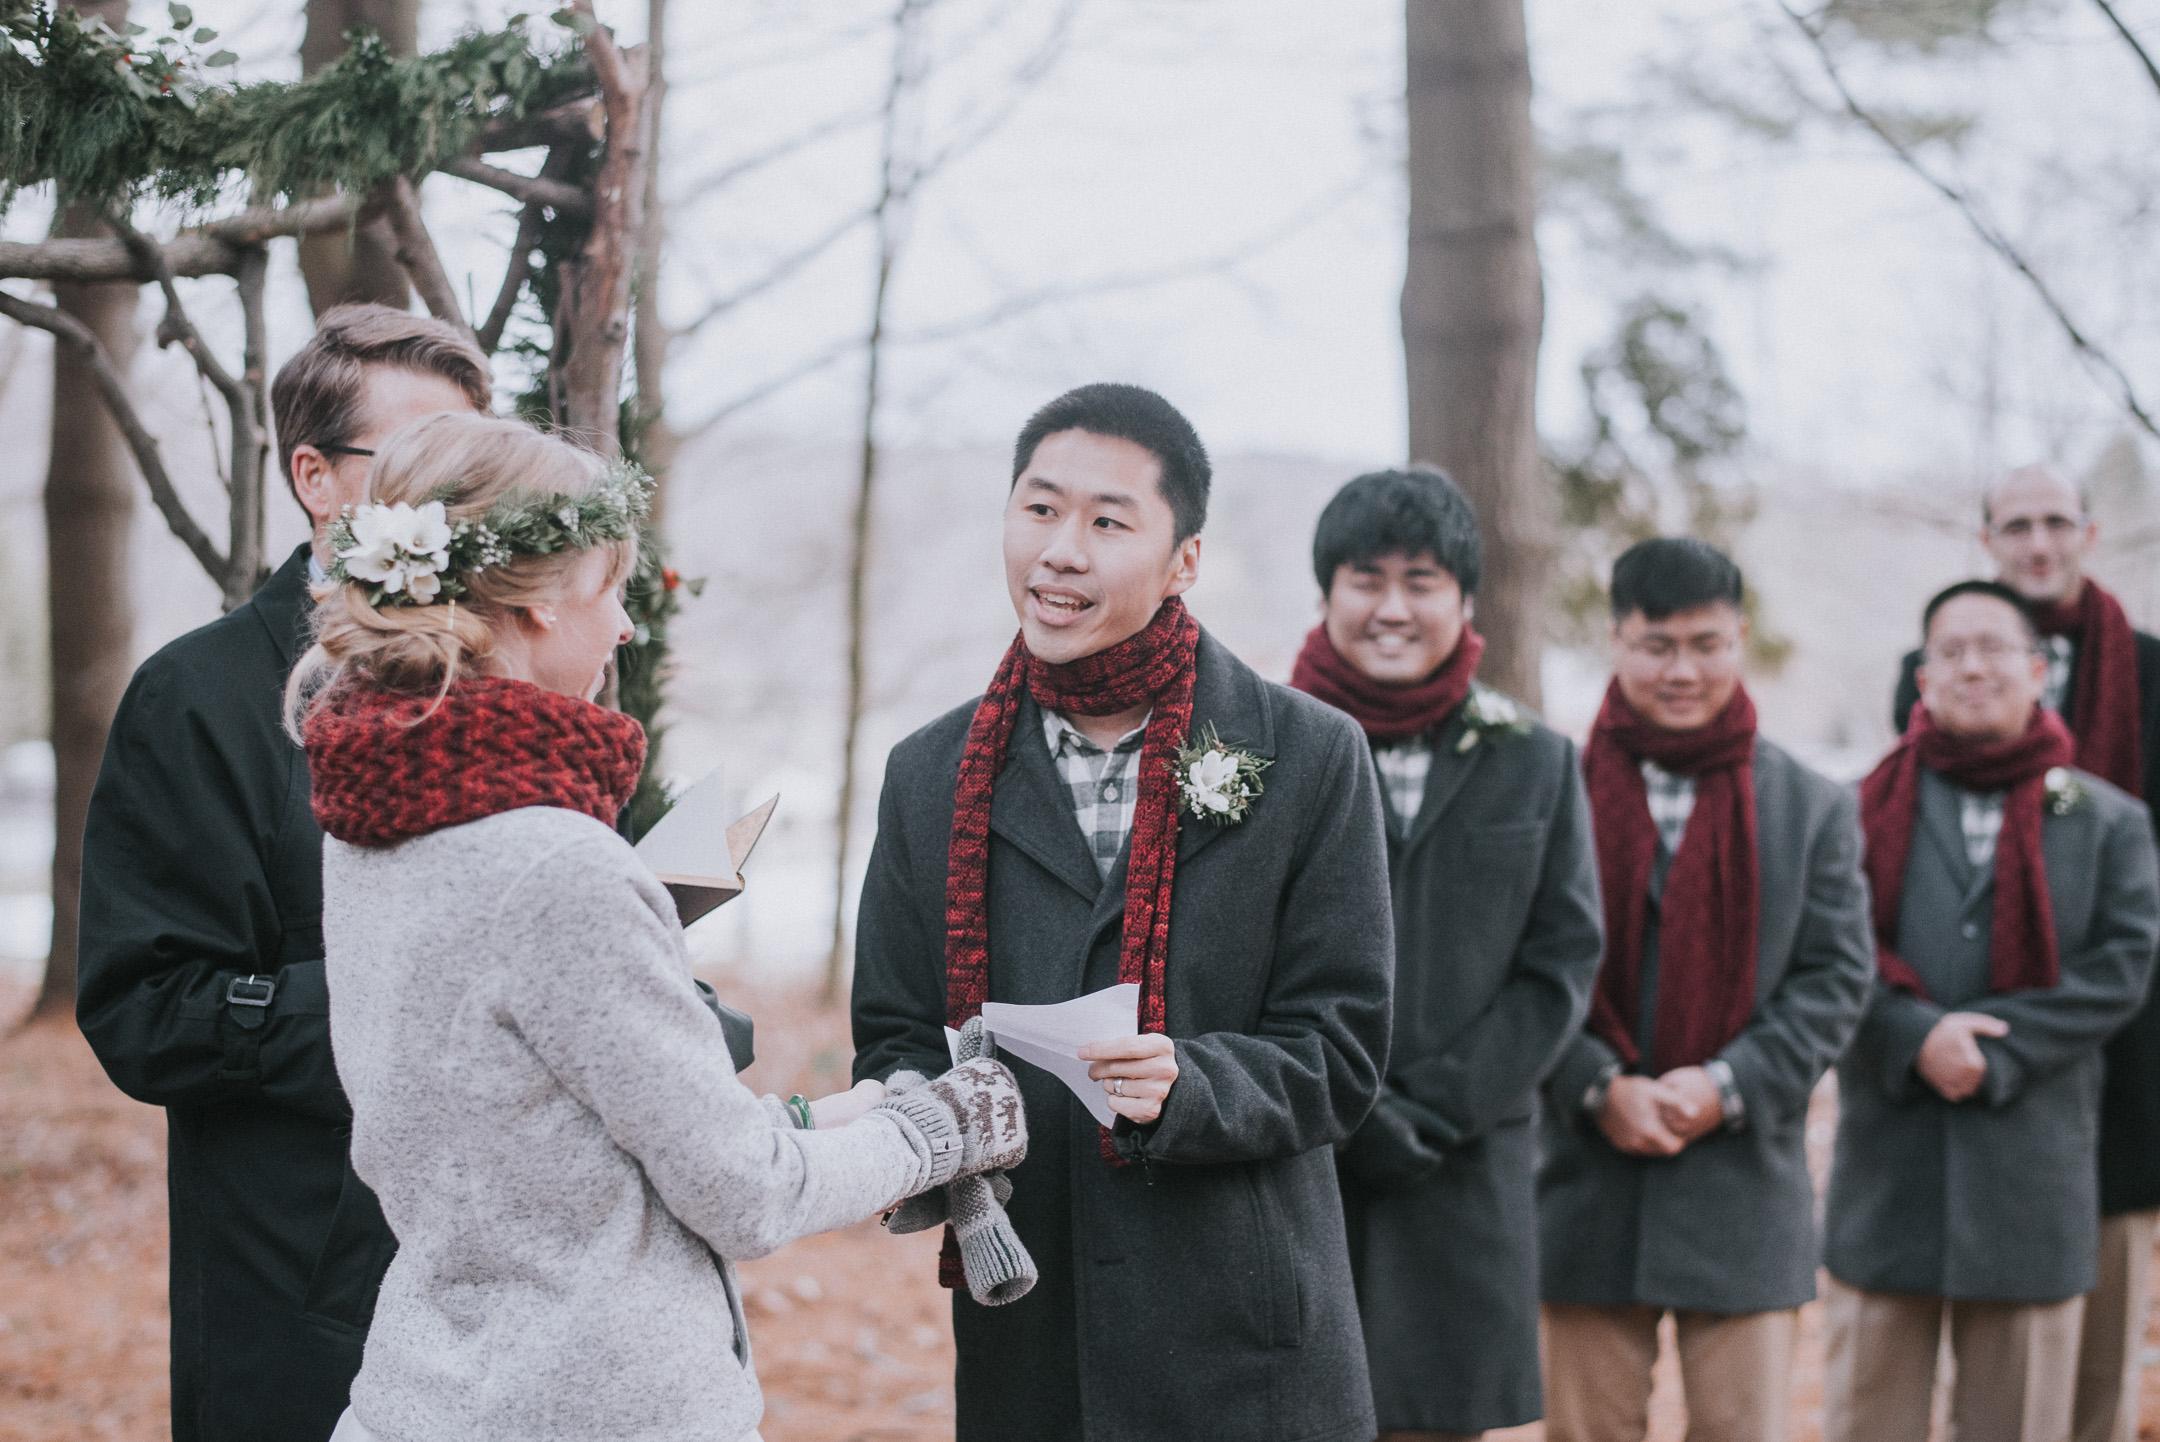 thurmont wedding photographer (21 of 38).jpg